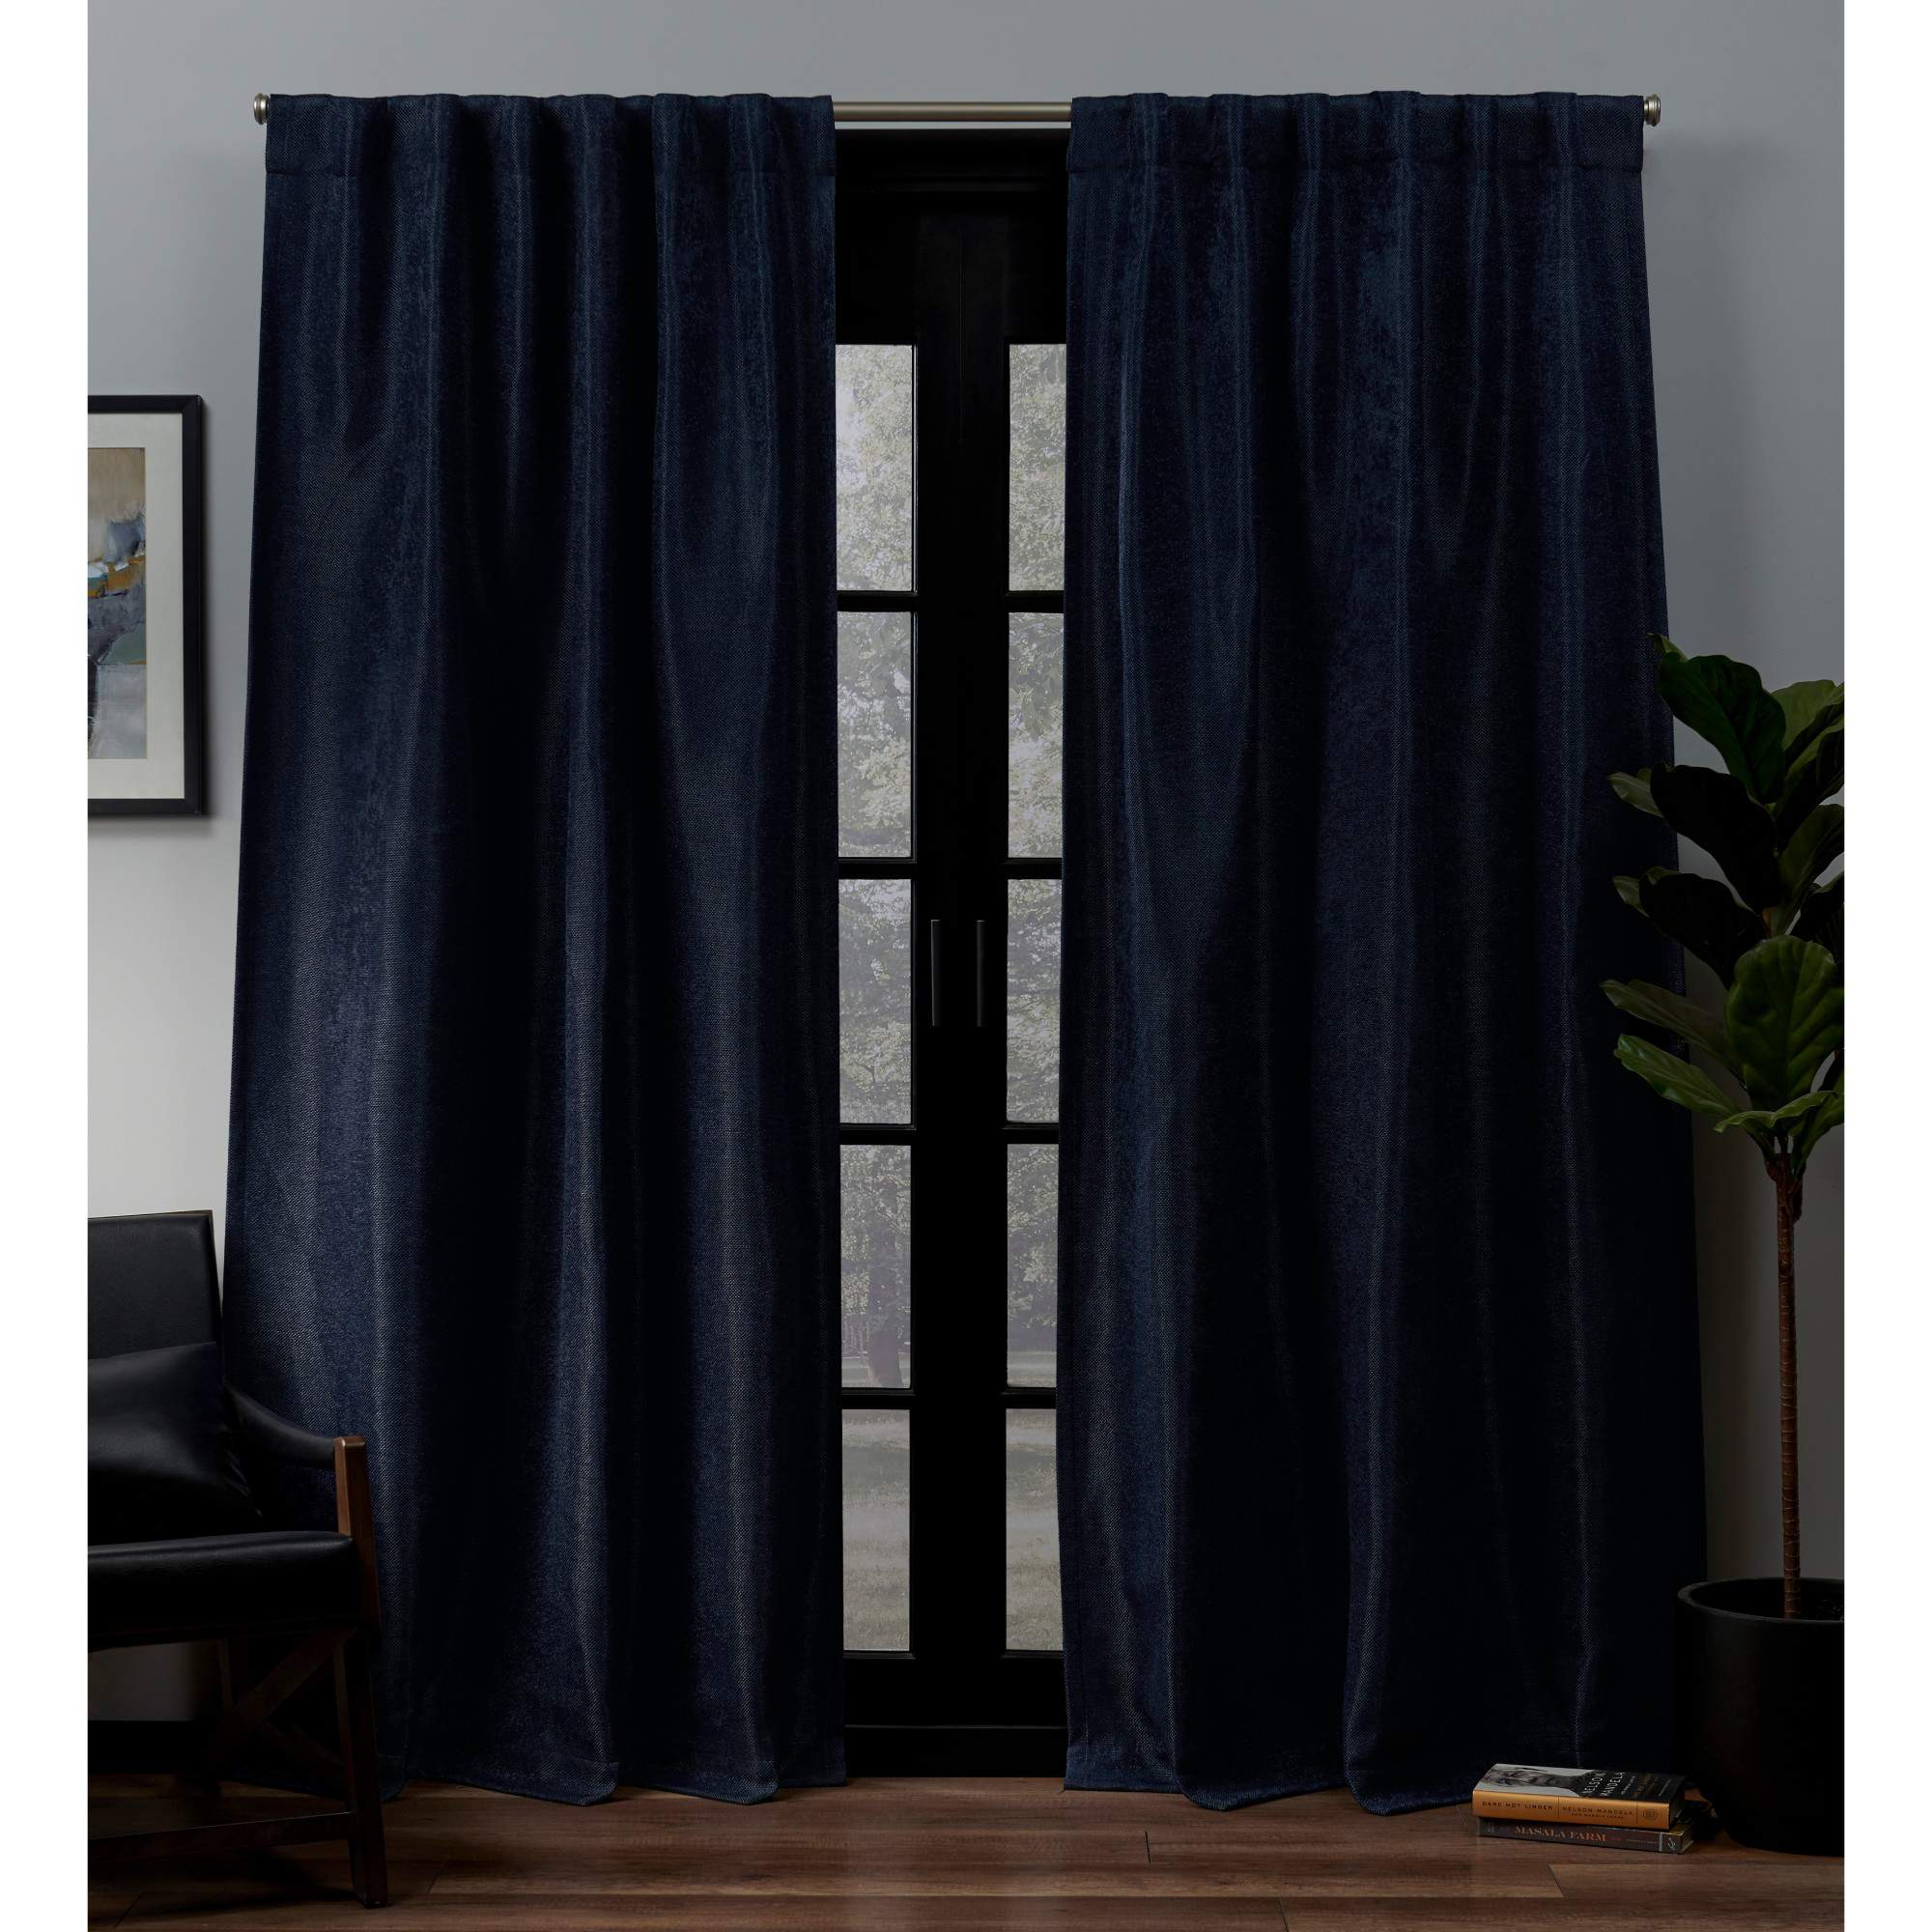 Exclusive Home Lancaster Woven Blackout Hidden Tab Curtain Panel Pair